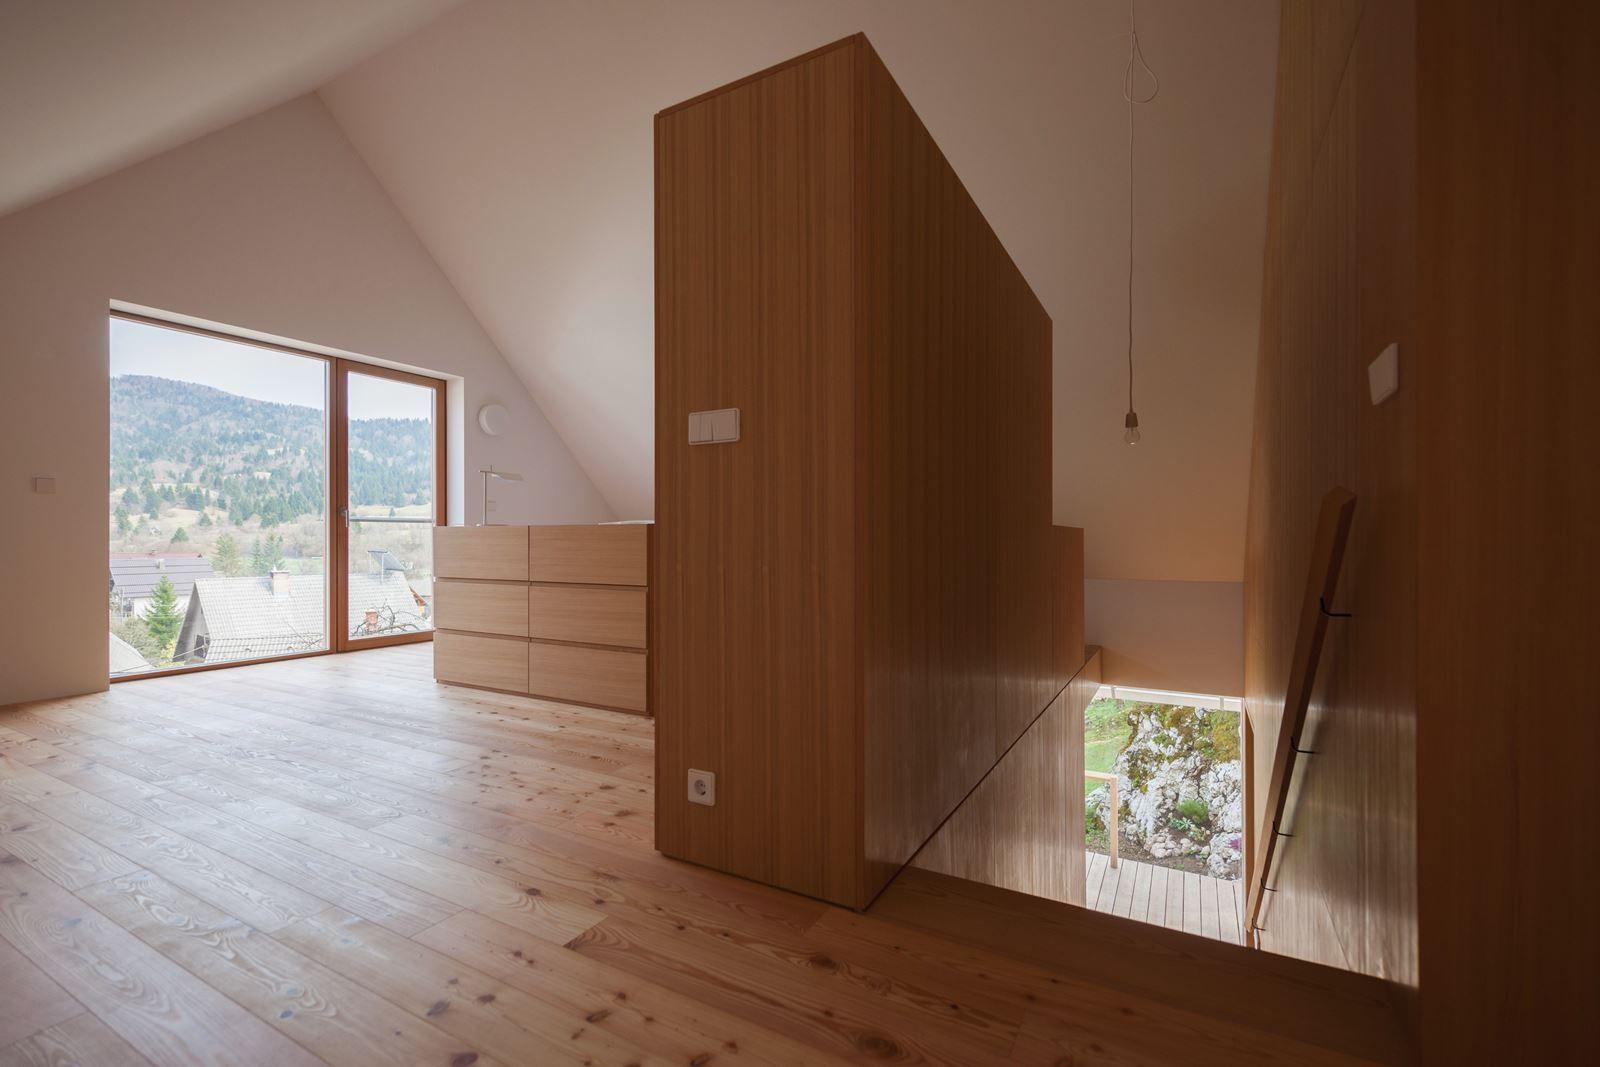 Una Casa Con Mansarda Sulle Alpi House Case Mansarda